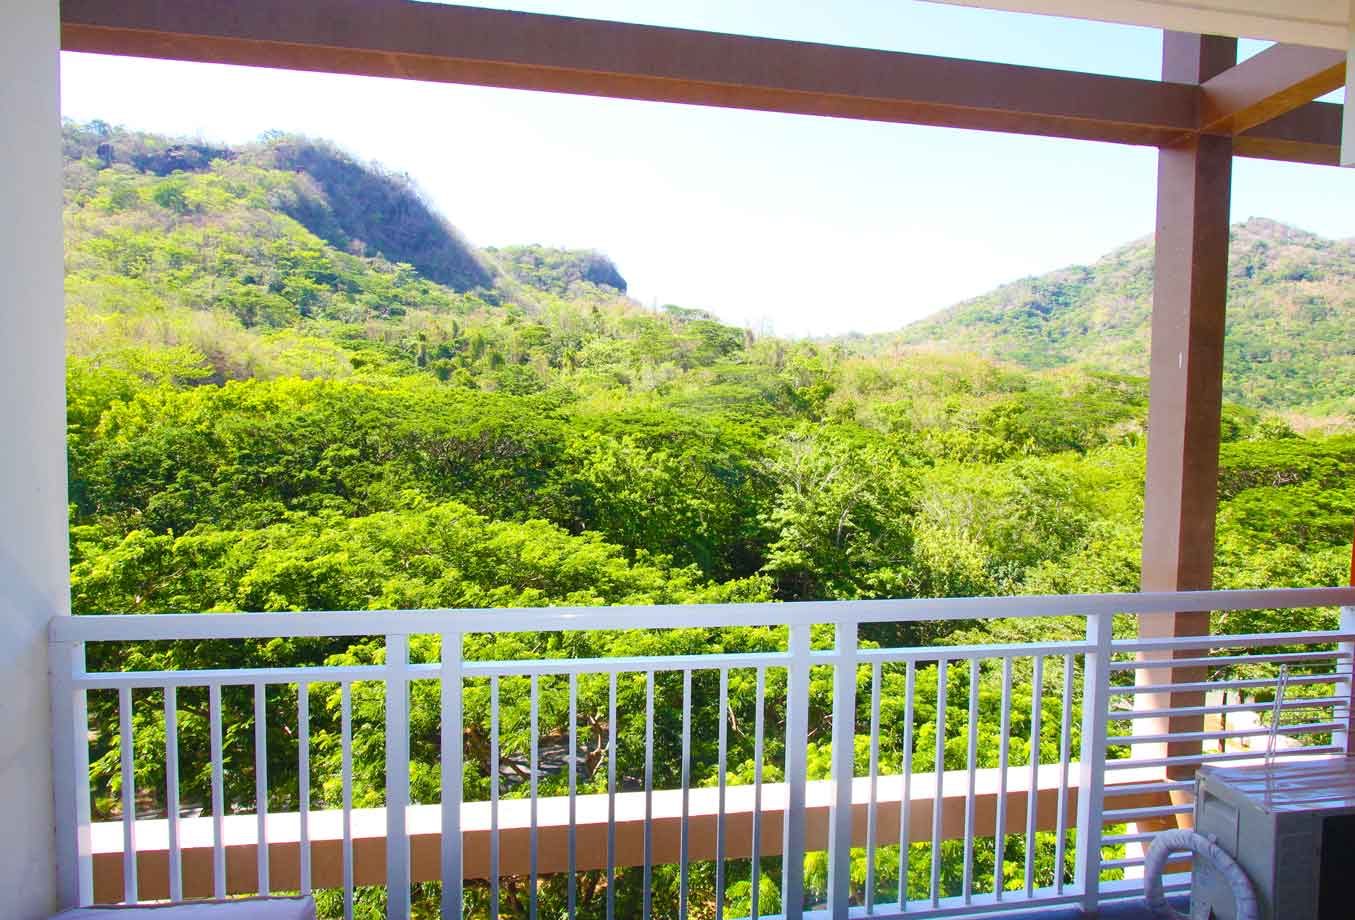 Hamilo Sample Images - myn balcony view 1280 low.